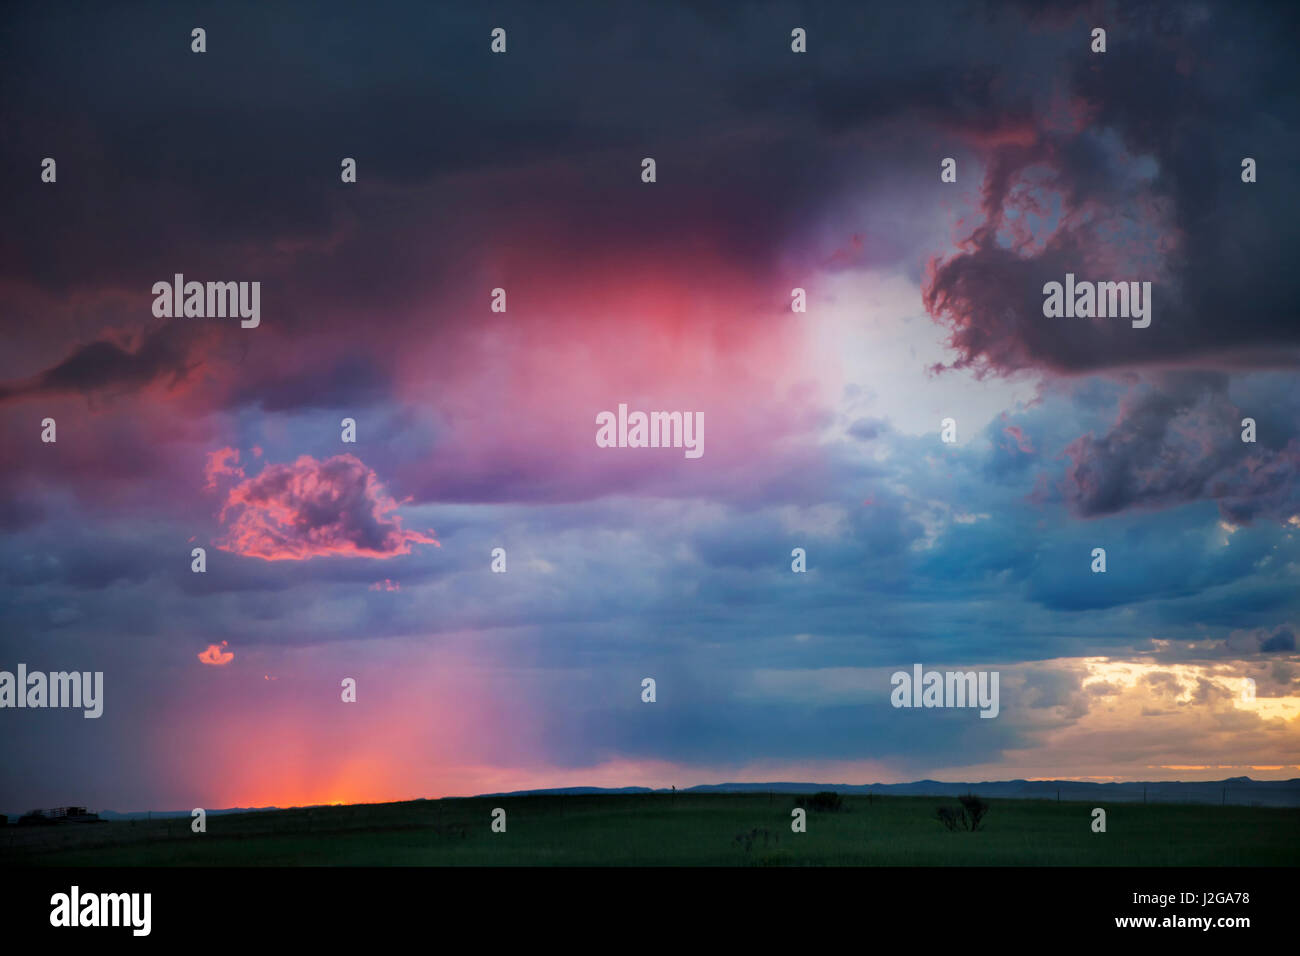 USA, Colorado, Front Range. Sunset thunderstorm on plains. Credit as: Don Grall / Jaynes Gallery / DanitaDelimont.com - Stock Image